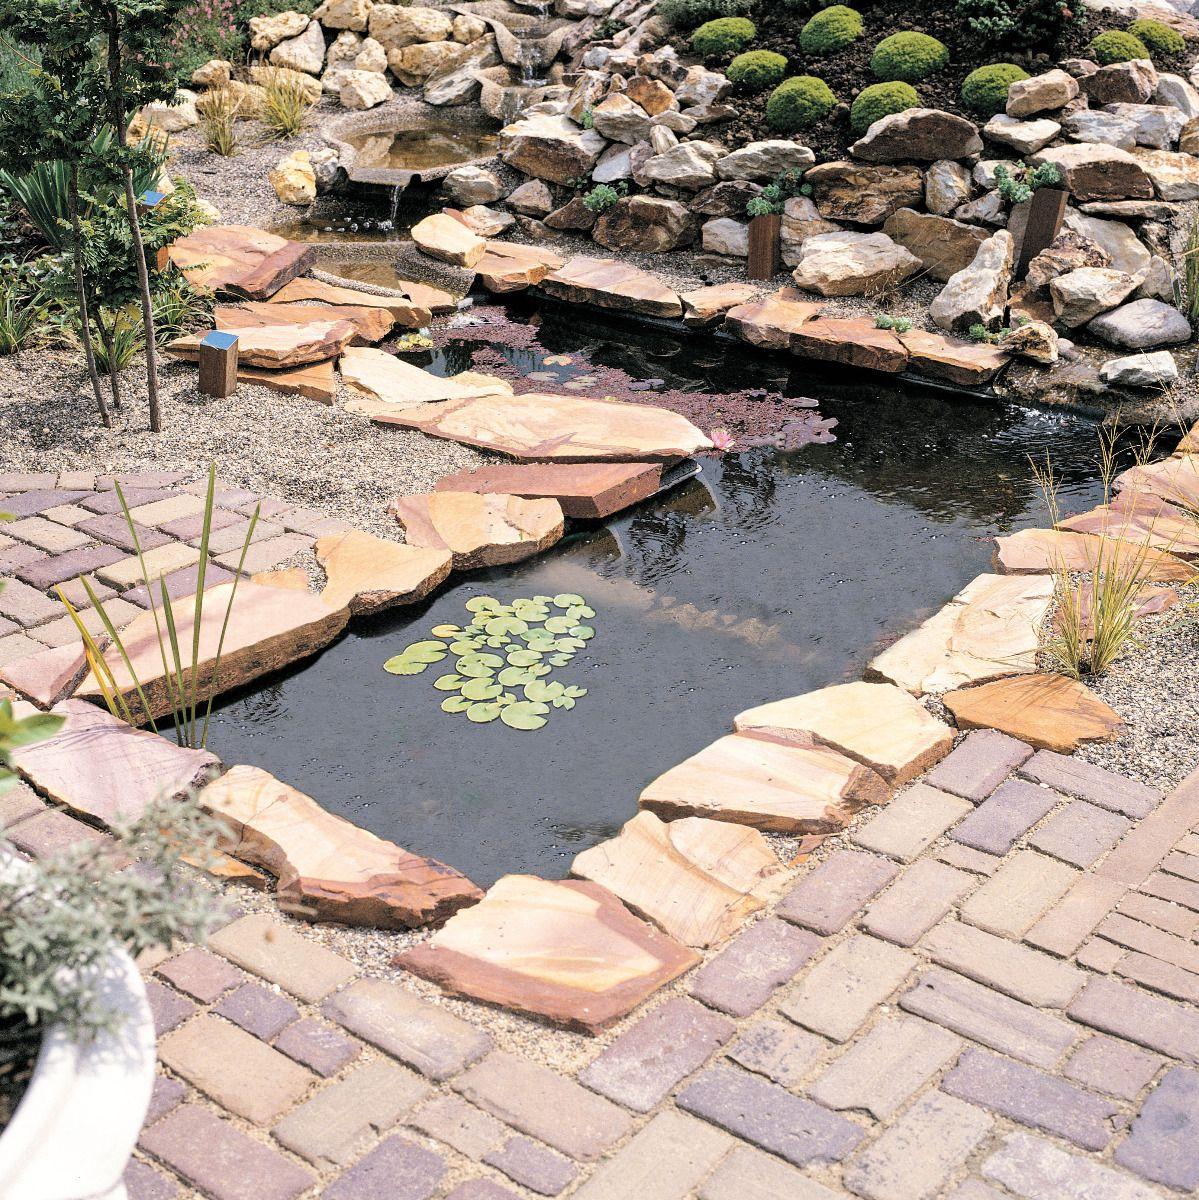 Comment Installer Un Bassin De Jardin Préformé ? concernant Bassin De Jardin Préformé